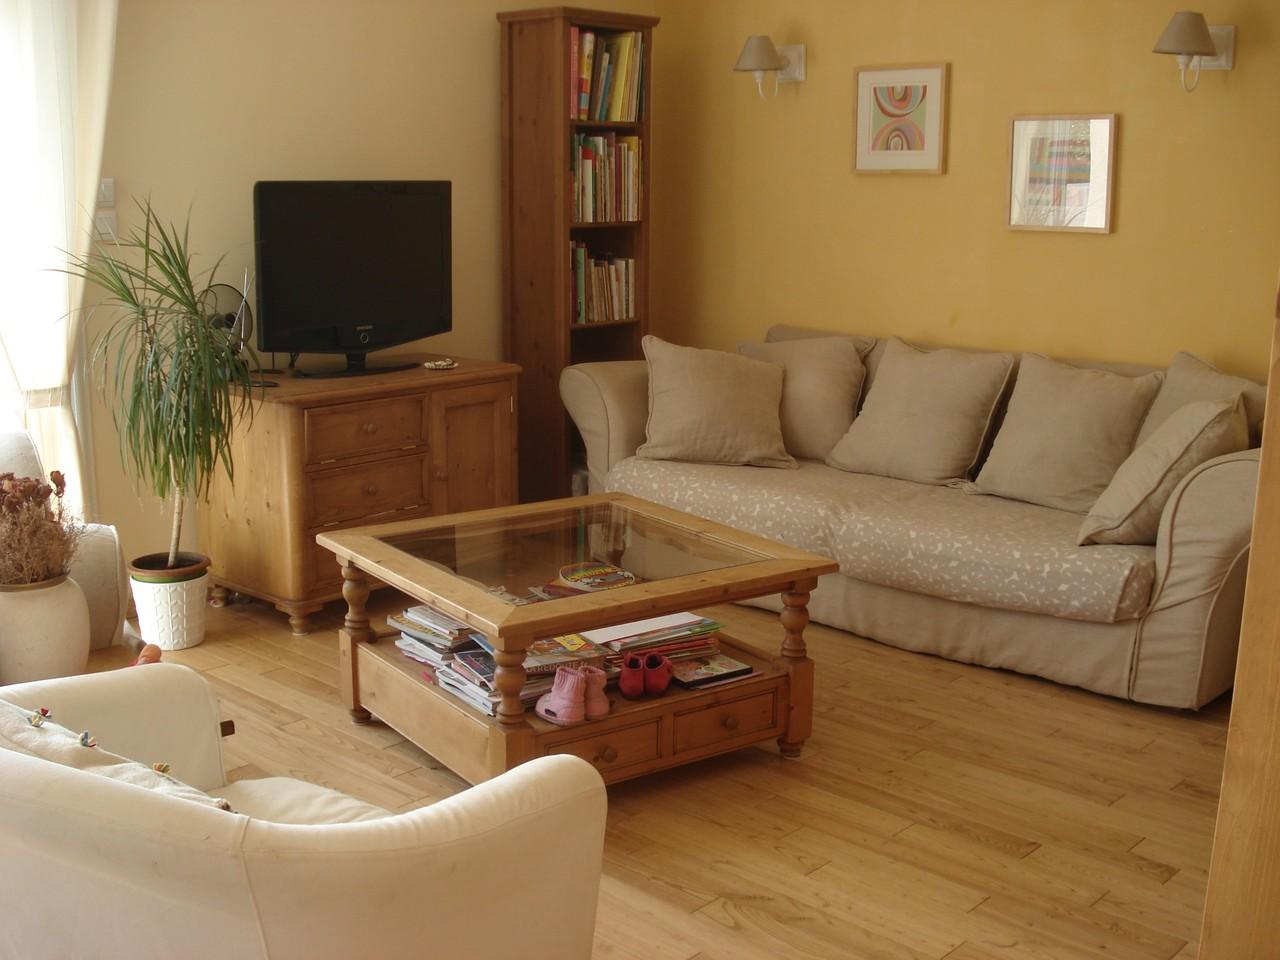 parquets massif coller 15 mm parquets castagn fabricant fran ais de parquets traditionnels. Black Bedroom Furniture Sets. Home Design Ideas